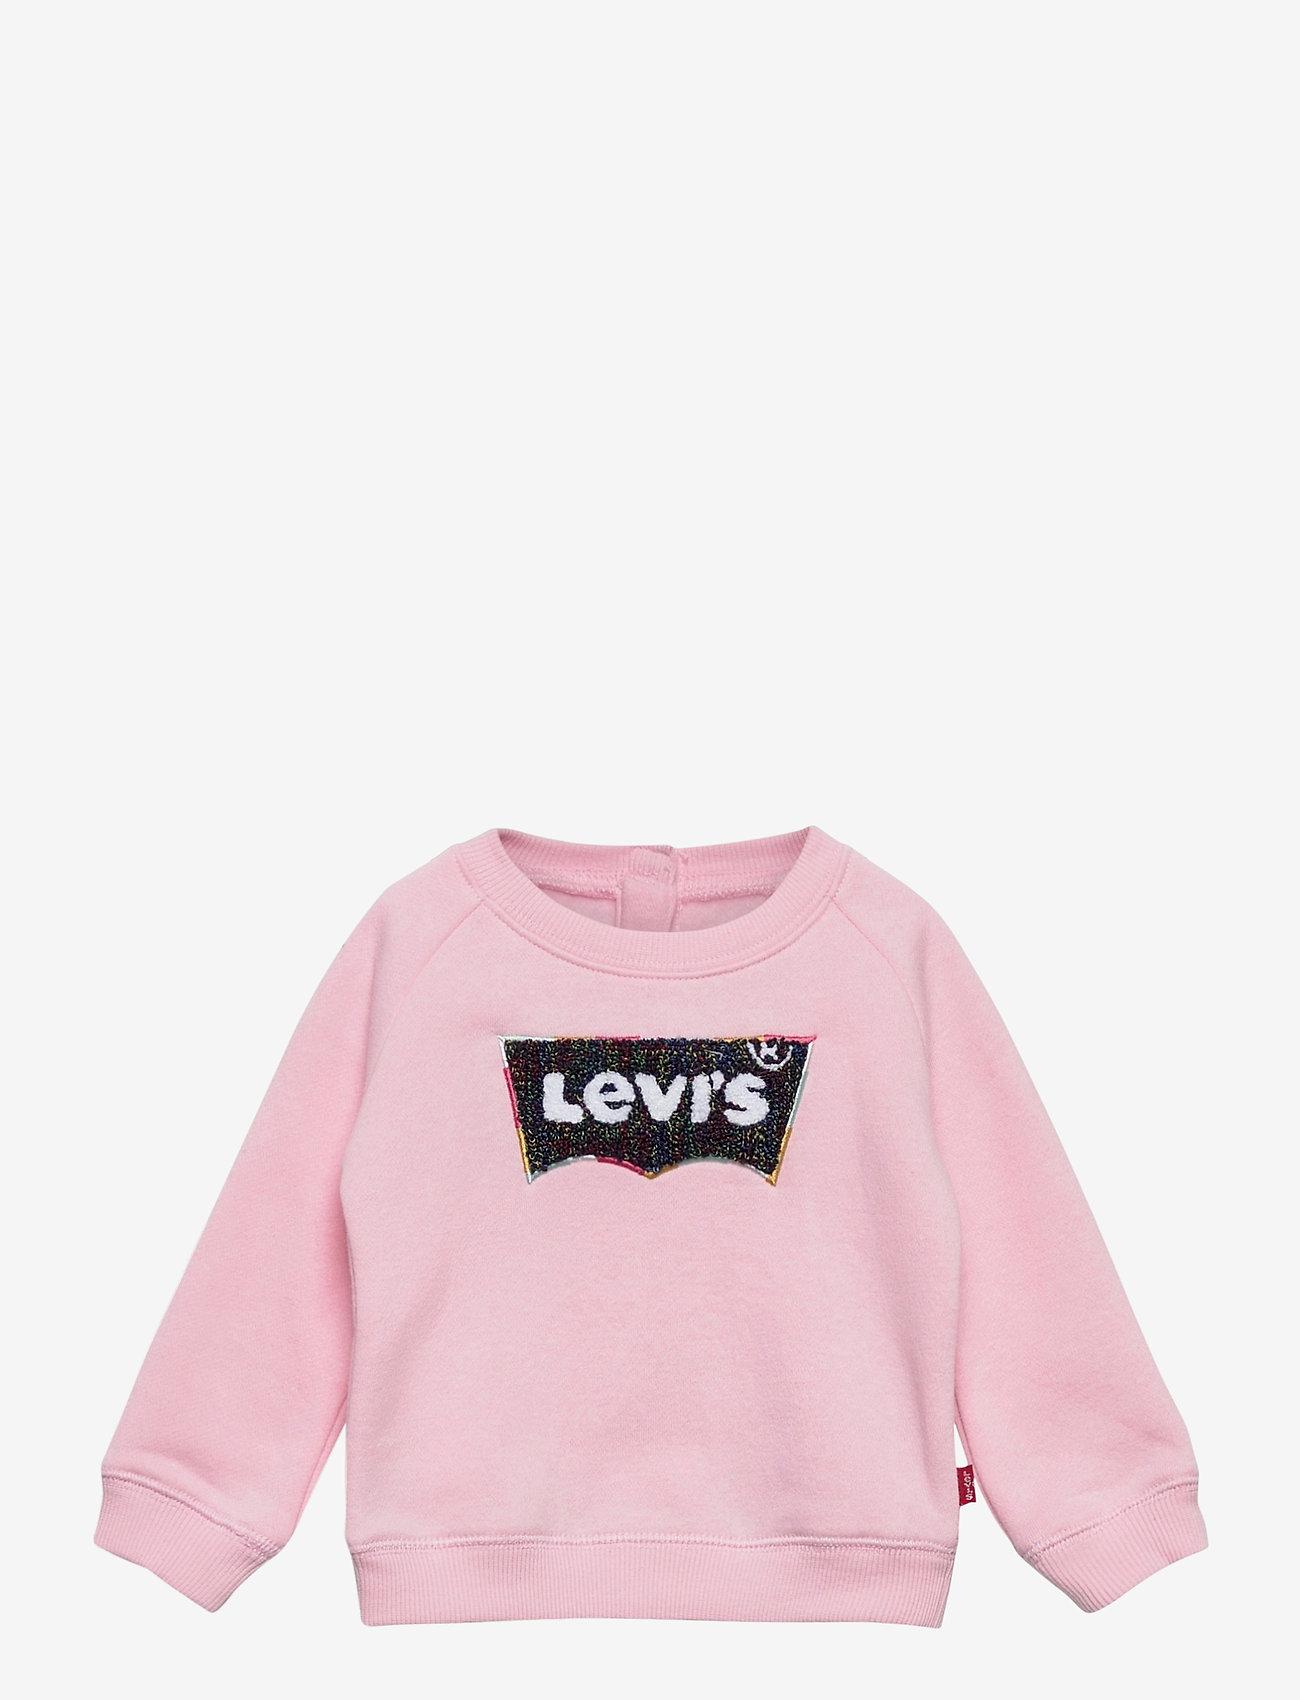 Levi's - CREW - sweatshirts - rose shadow - 0